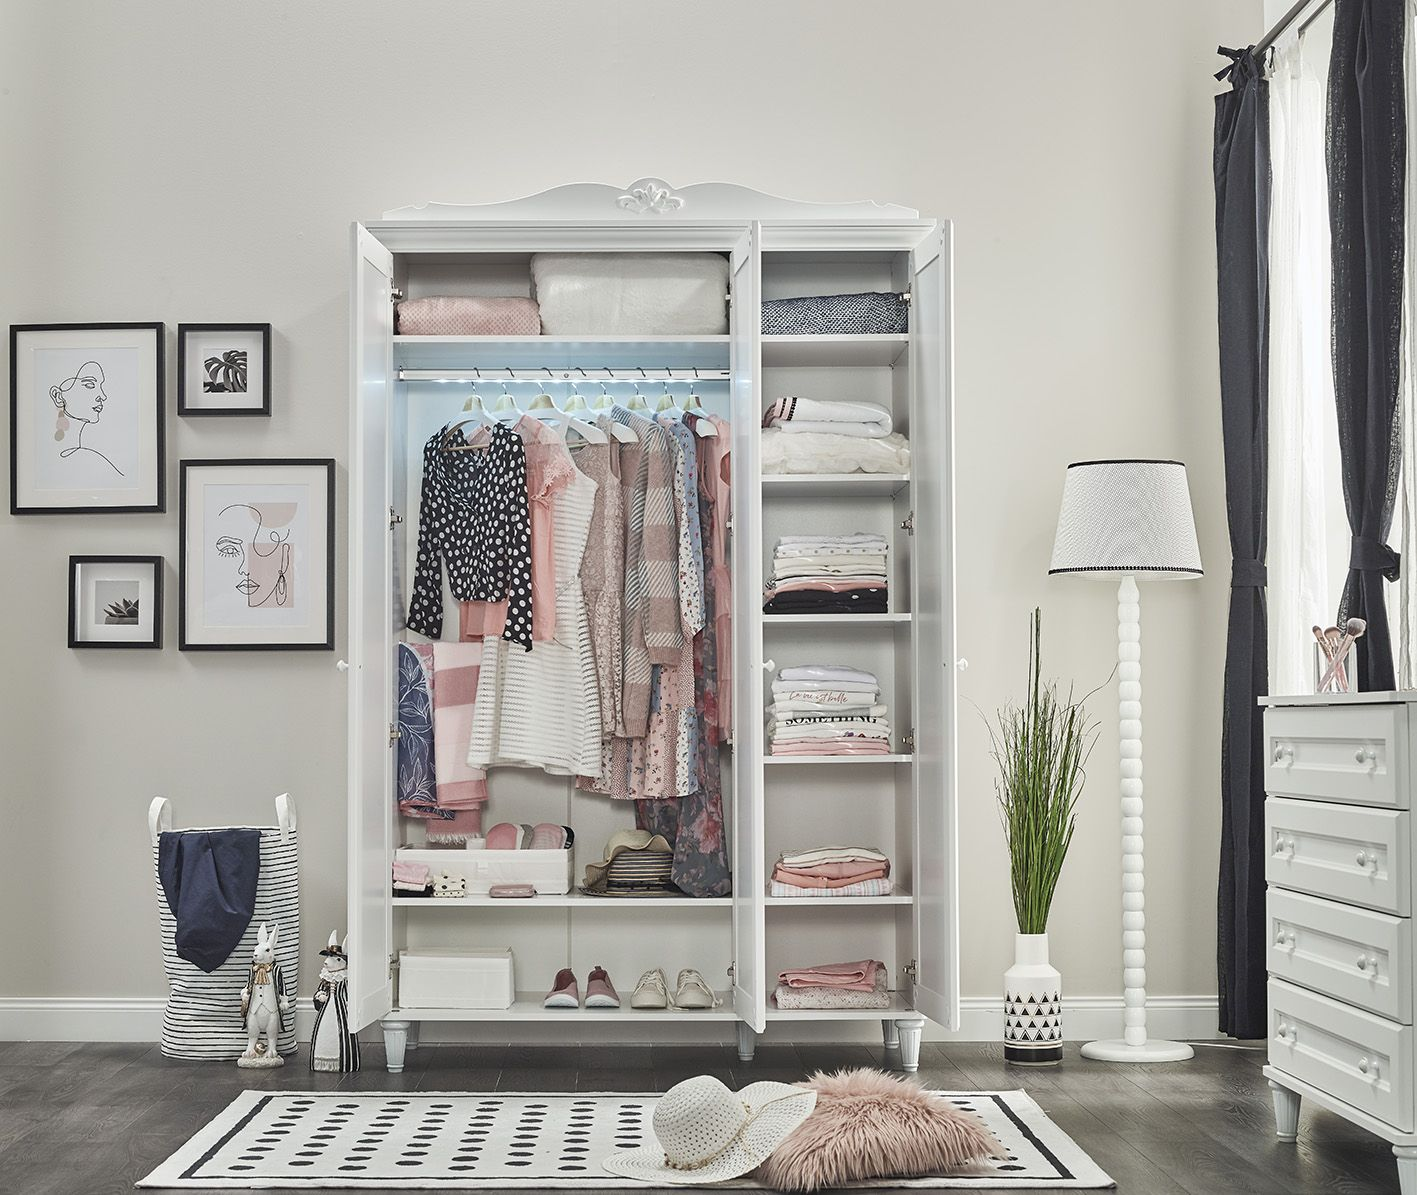 Kleiderschrank Lory Jugendstil 3-Türig mit LEDs in Weiss